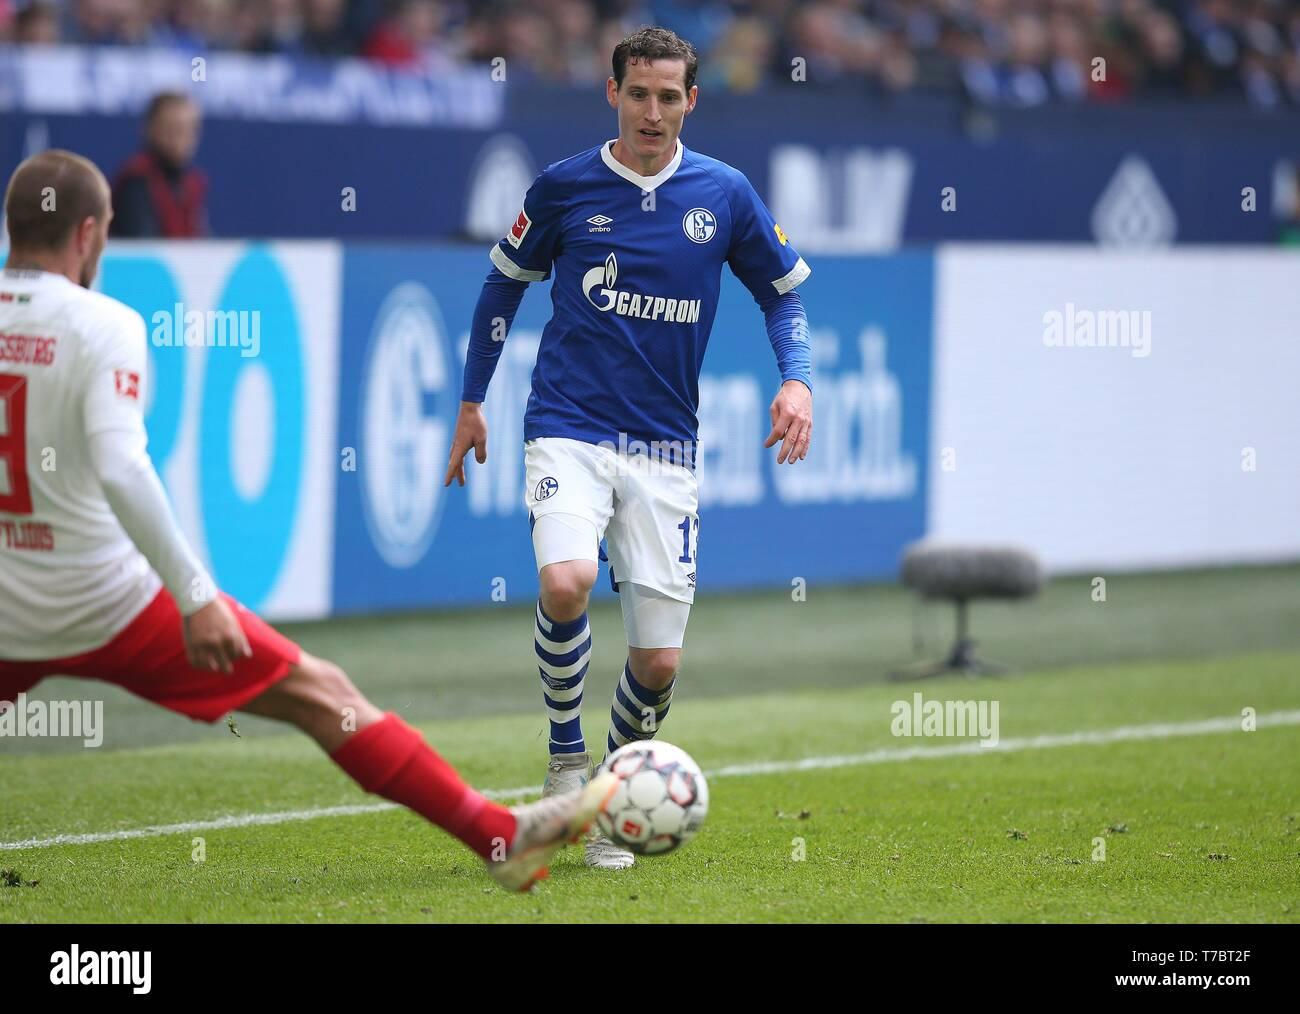 firo: 05.05.2019, Football, 2018/2019, 1.Bundesliga: FC Schalke 04 - FC Augsburg single action, Sebastian Rudy   usage worldwide - Stock Image